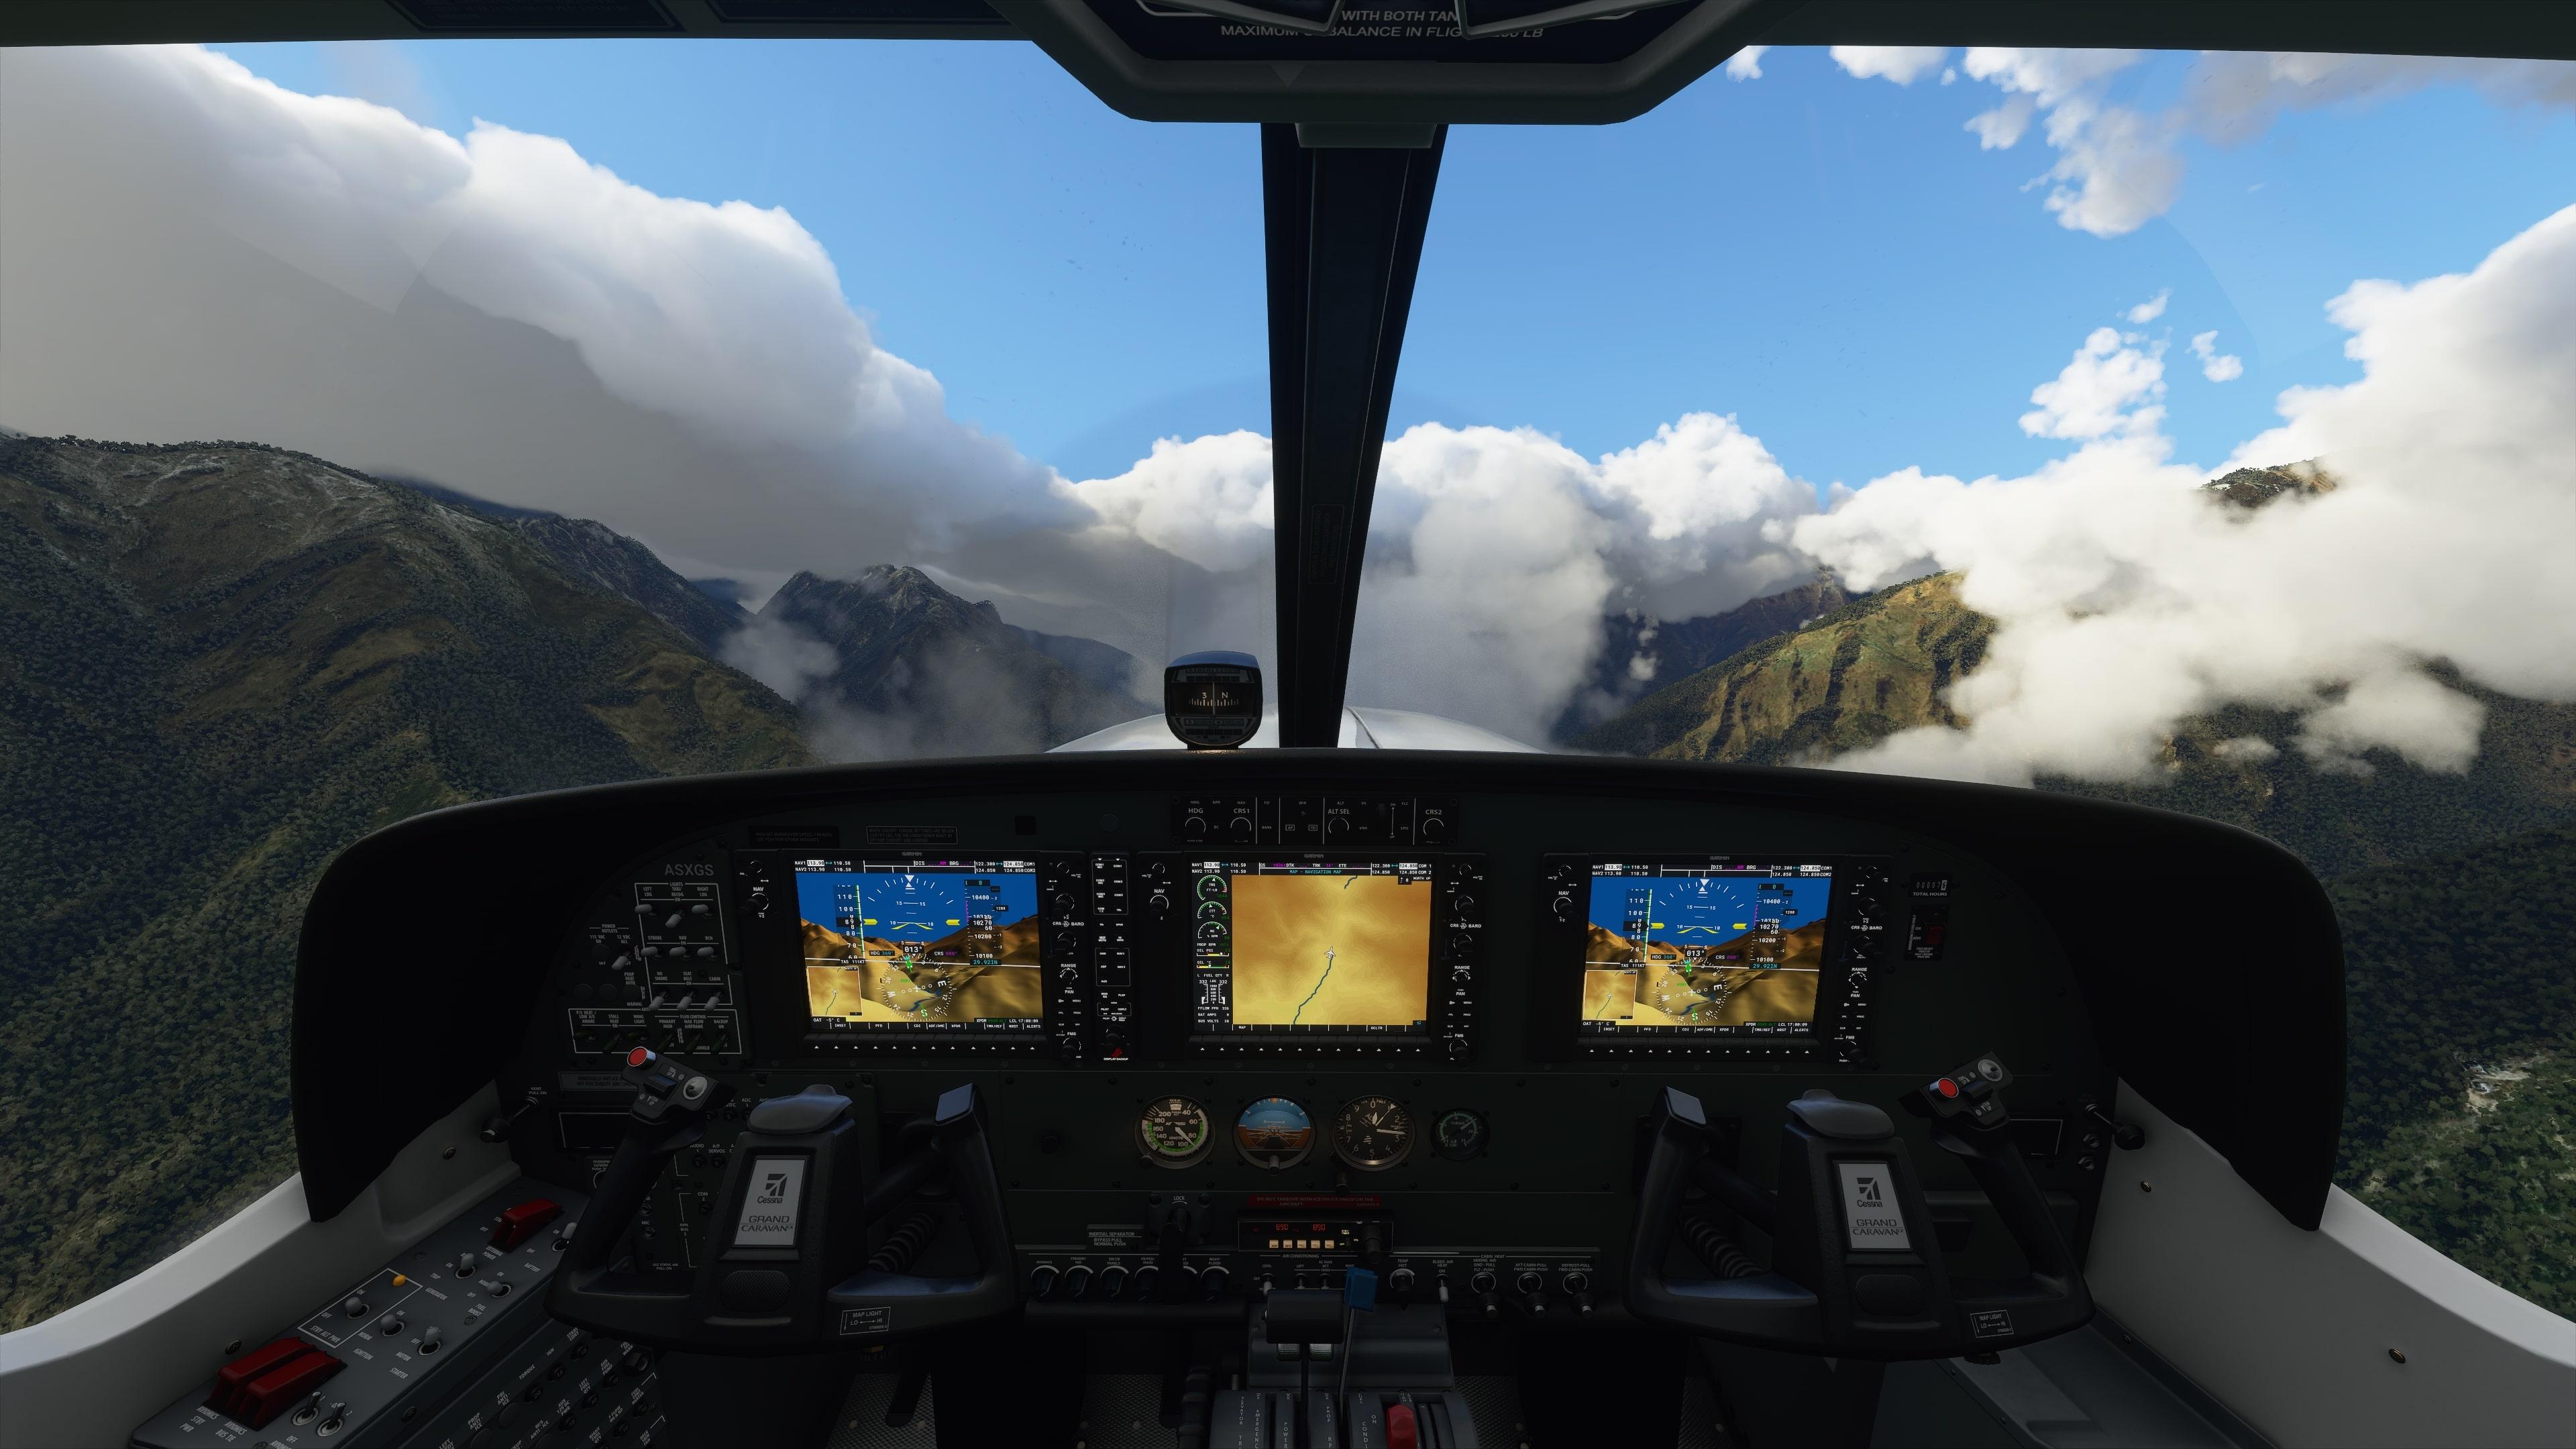 MicrosoftFlightSimulator PC Div 007